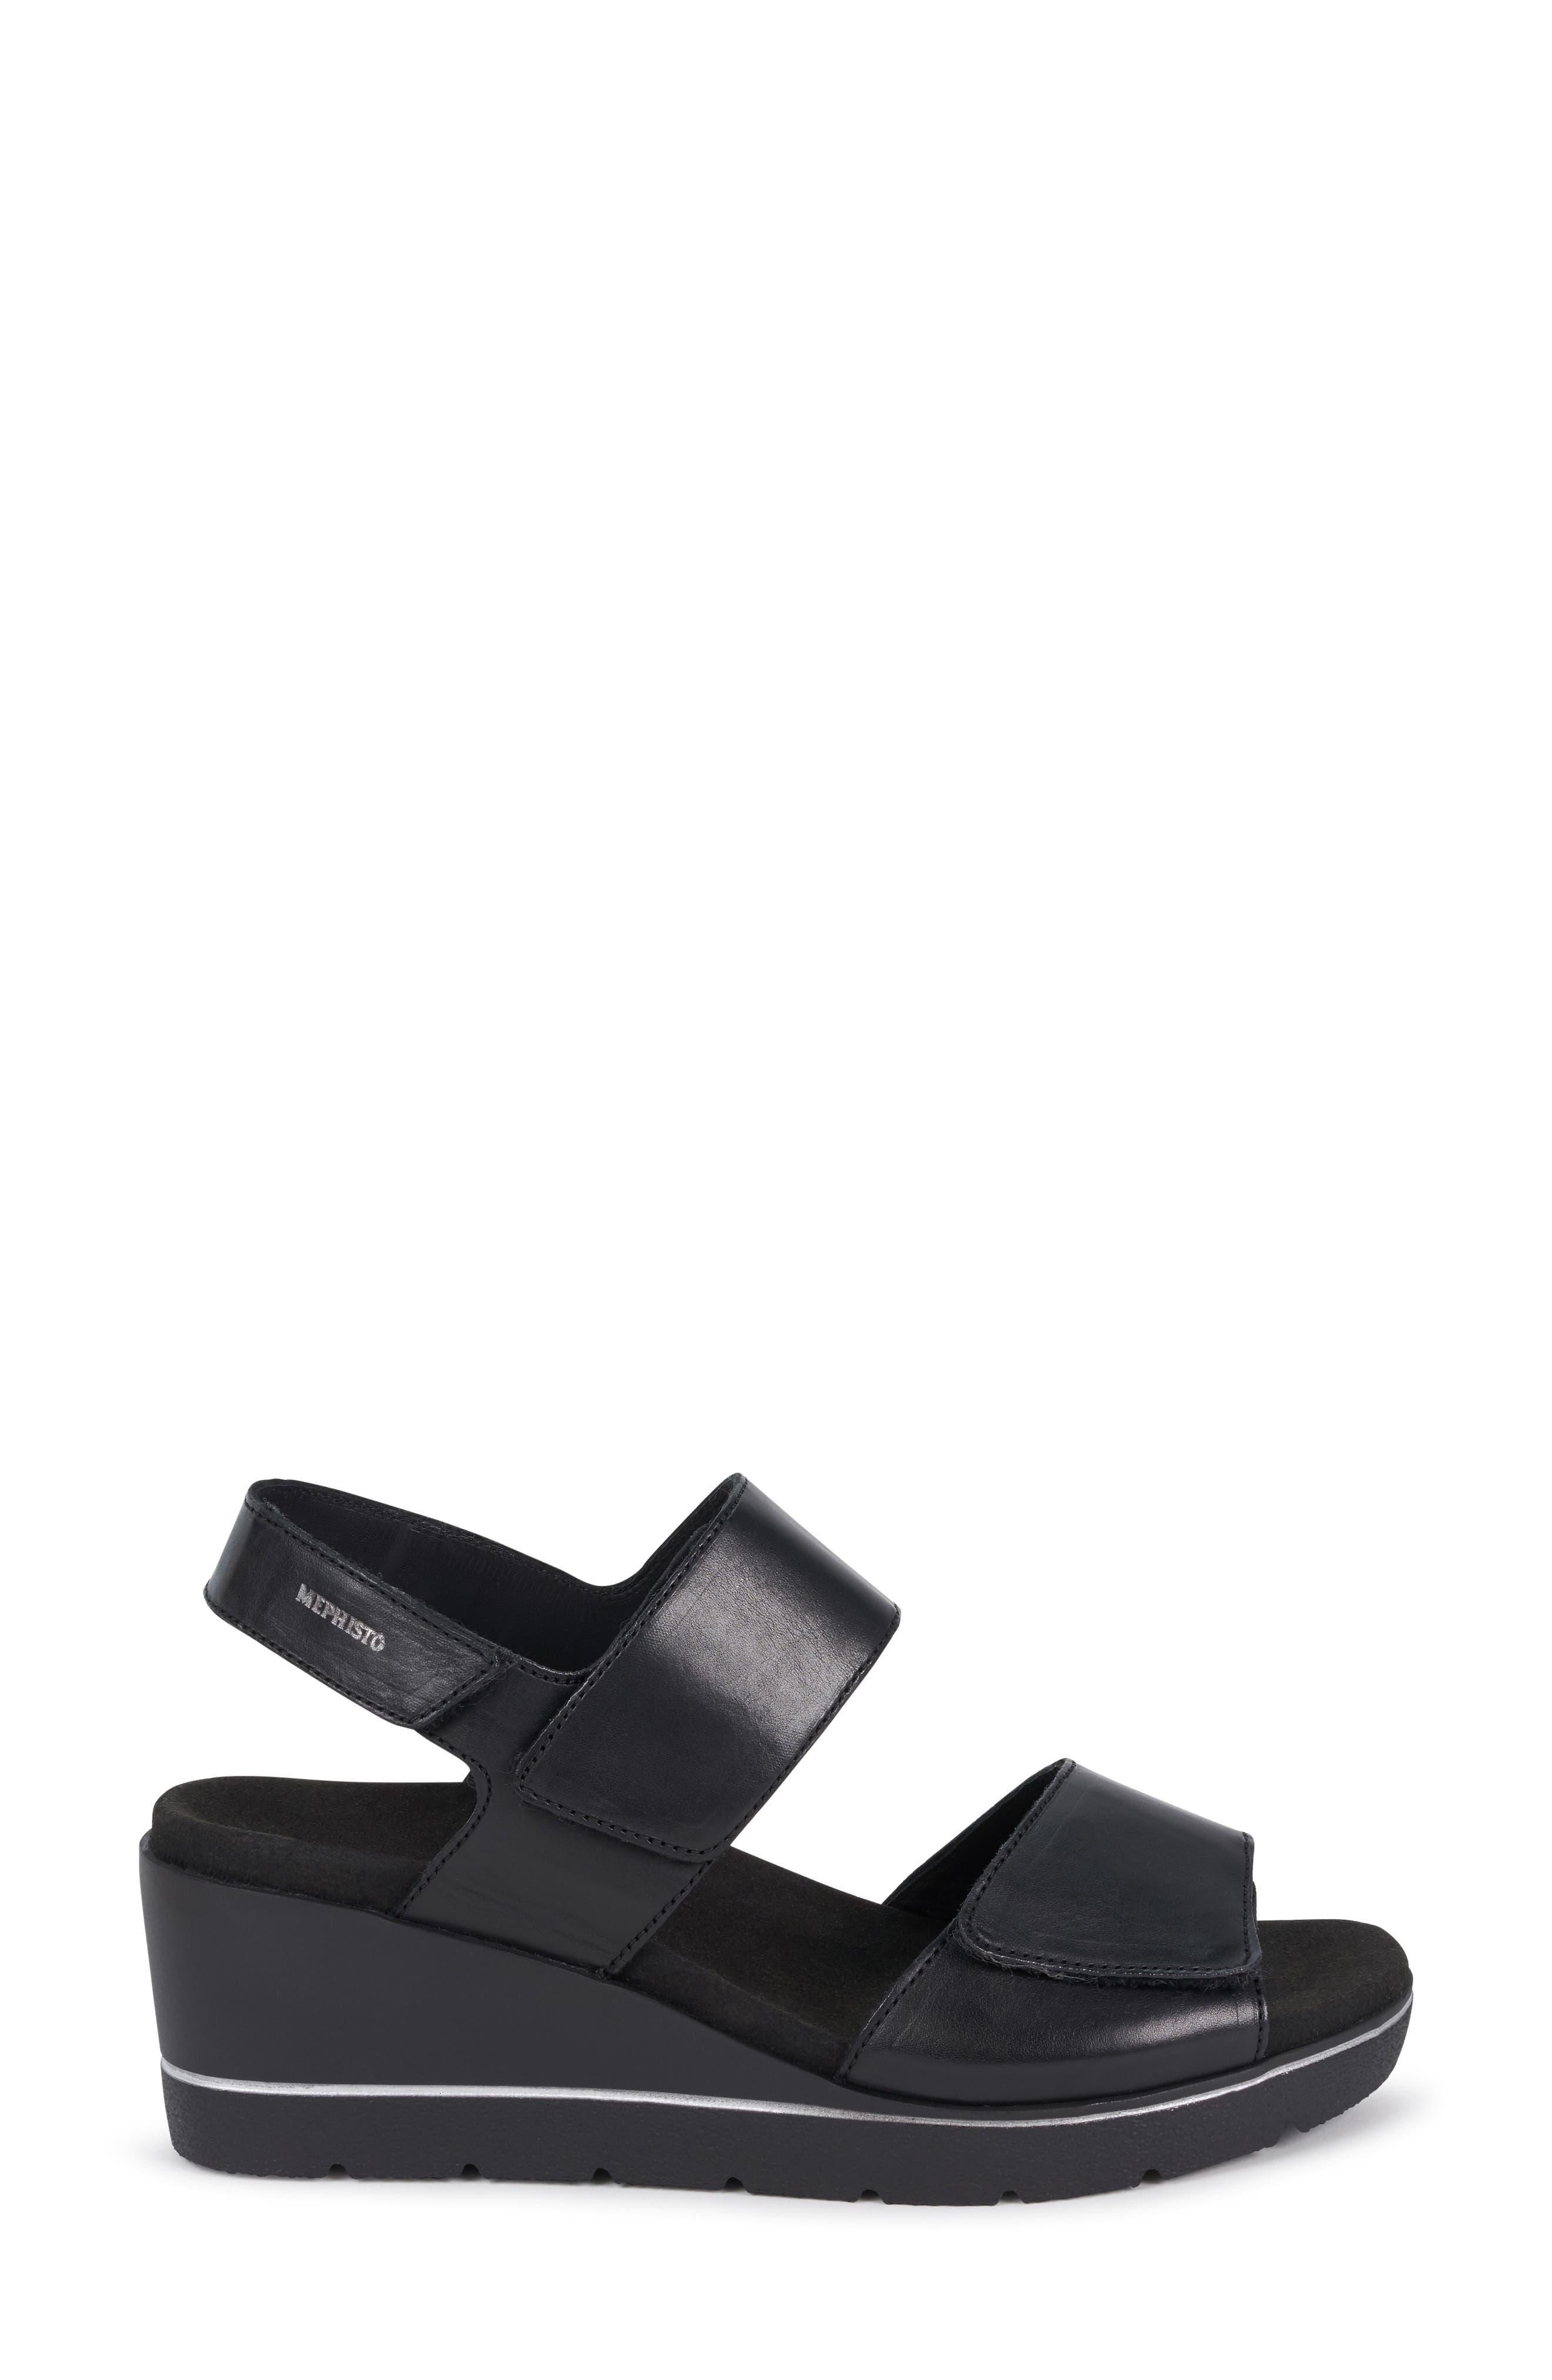 MEPHISTO, Engelina Wedge Sandal, Alternate thumbnail 3, color, BLACK SILK LEATHER